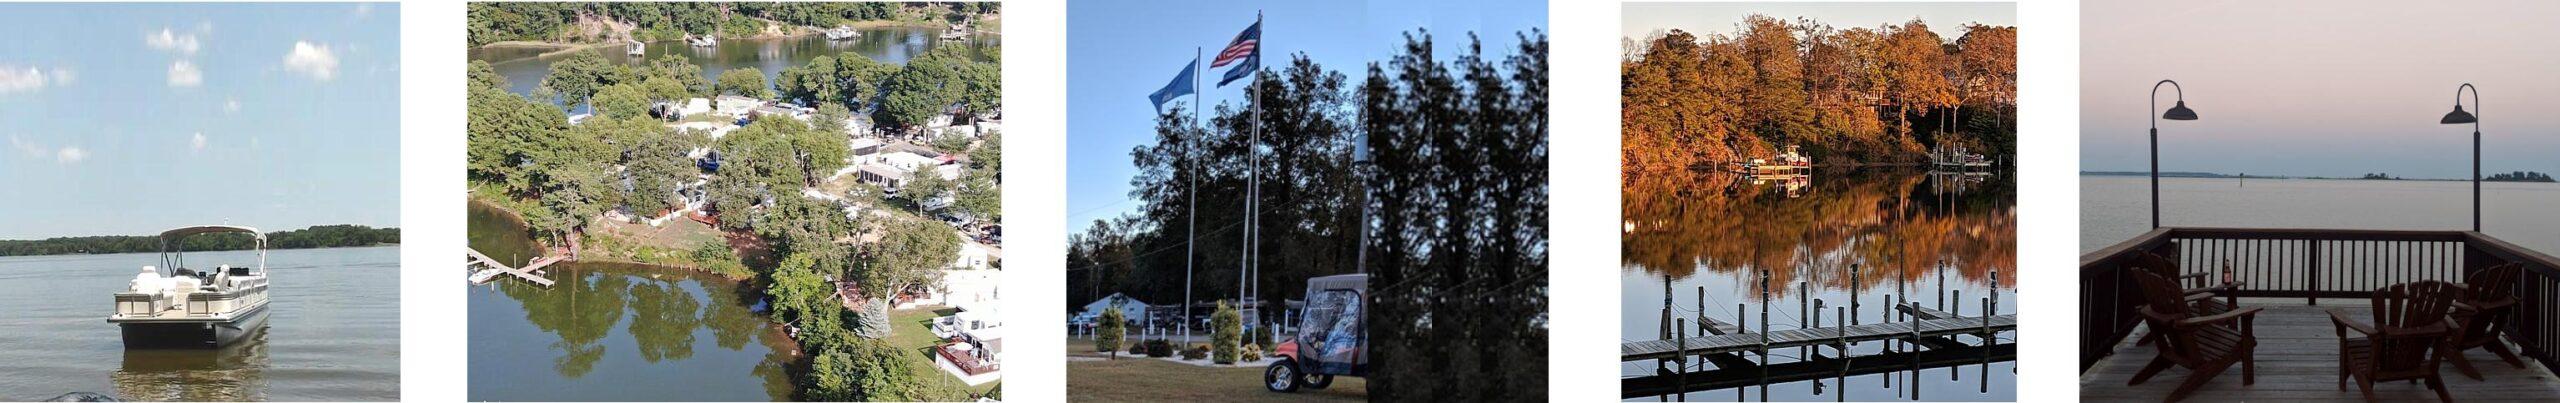 Bush Park Camping VA